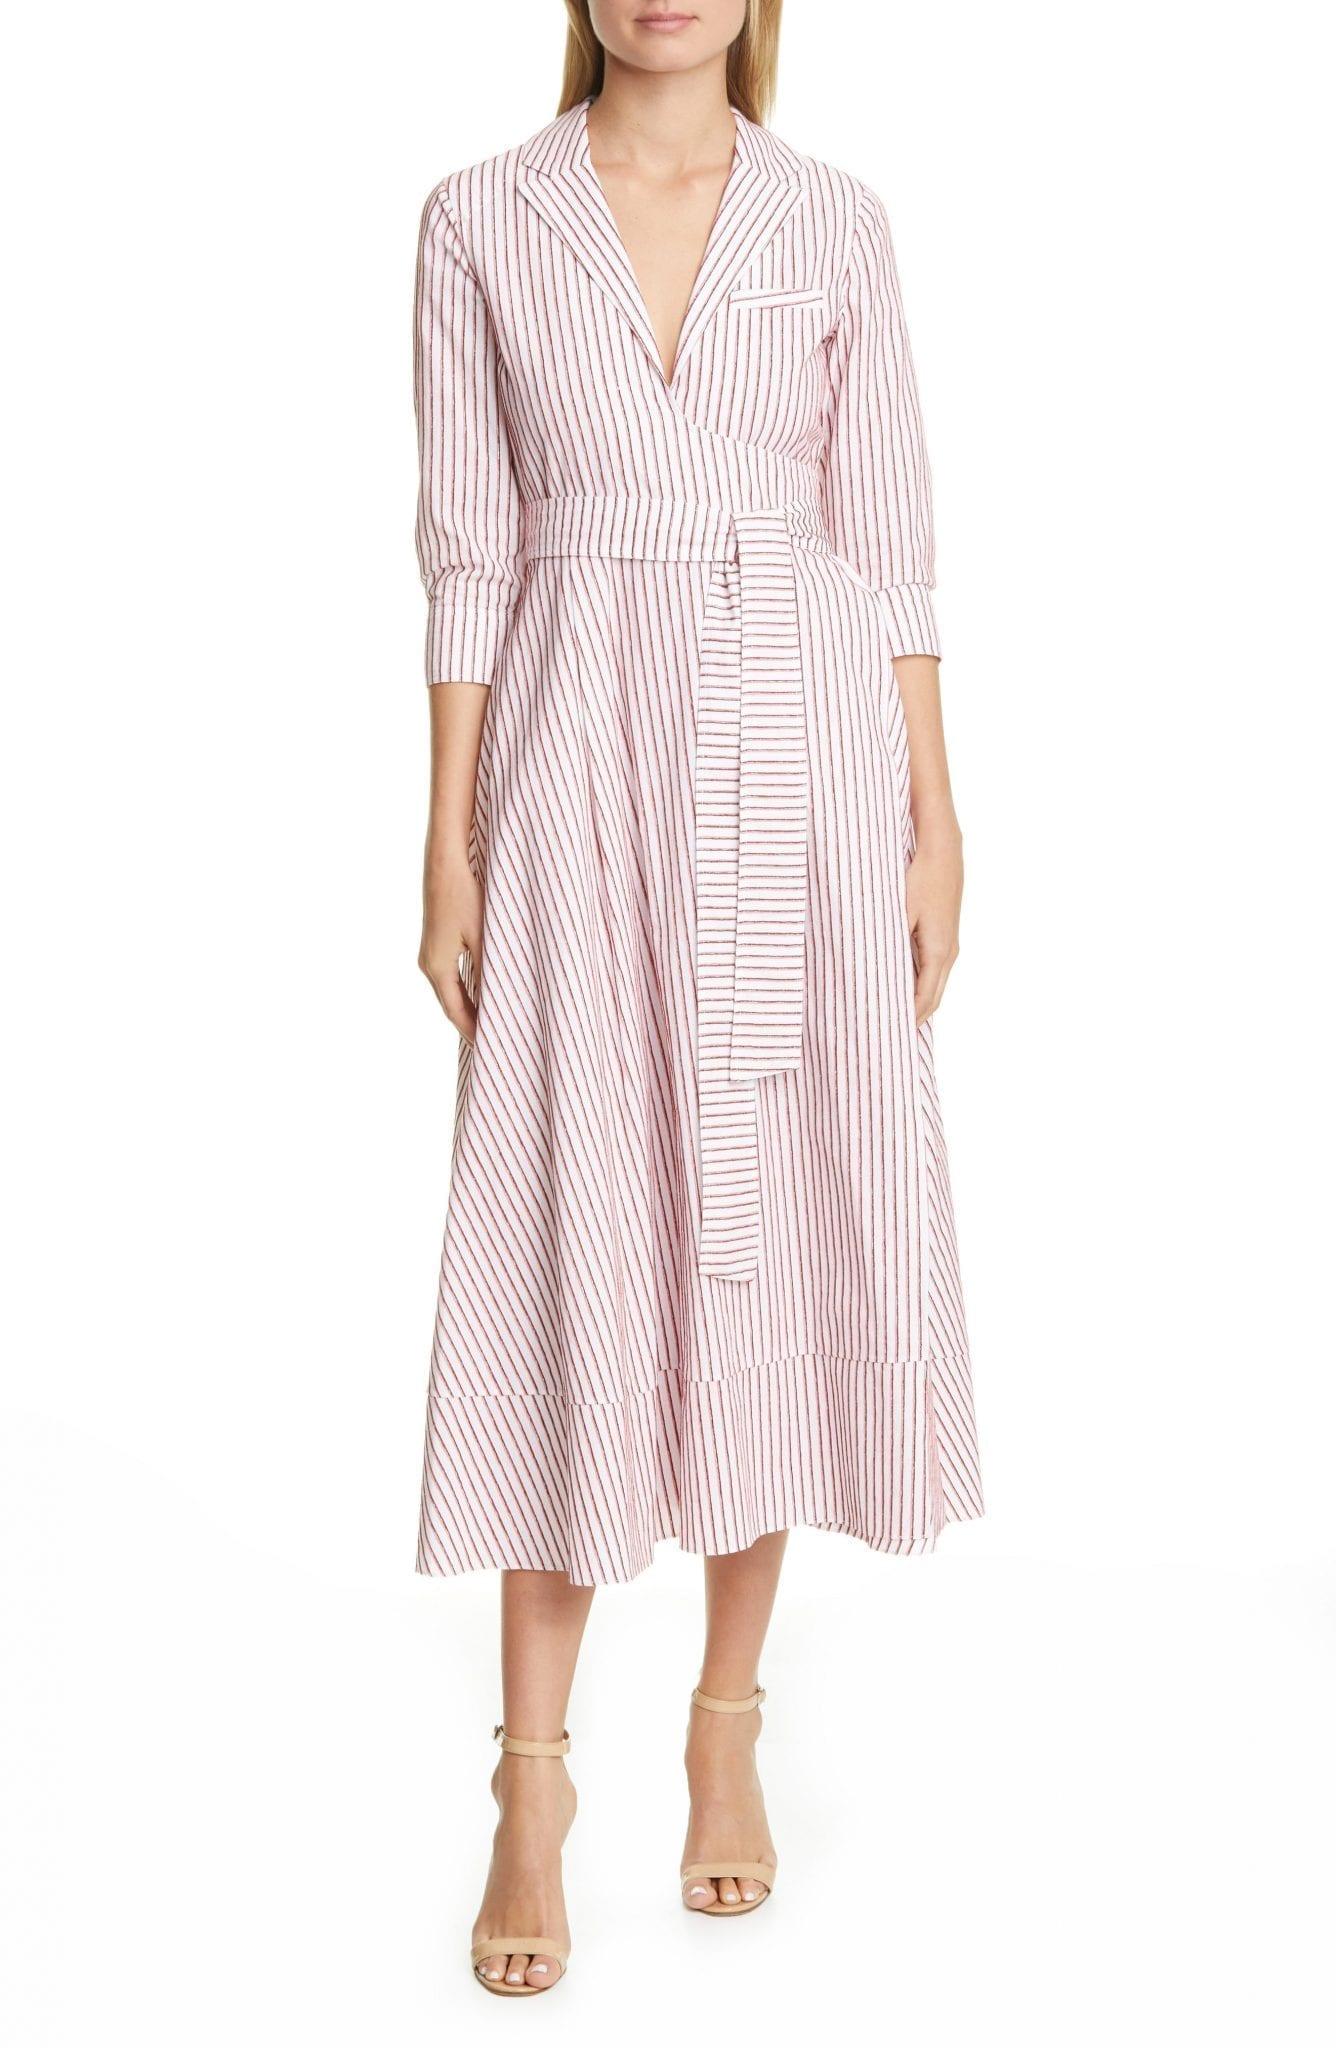 BY ANY OTHER NAME Velvet Stripe Cotton Midi Wrap Dress